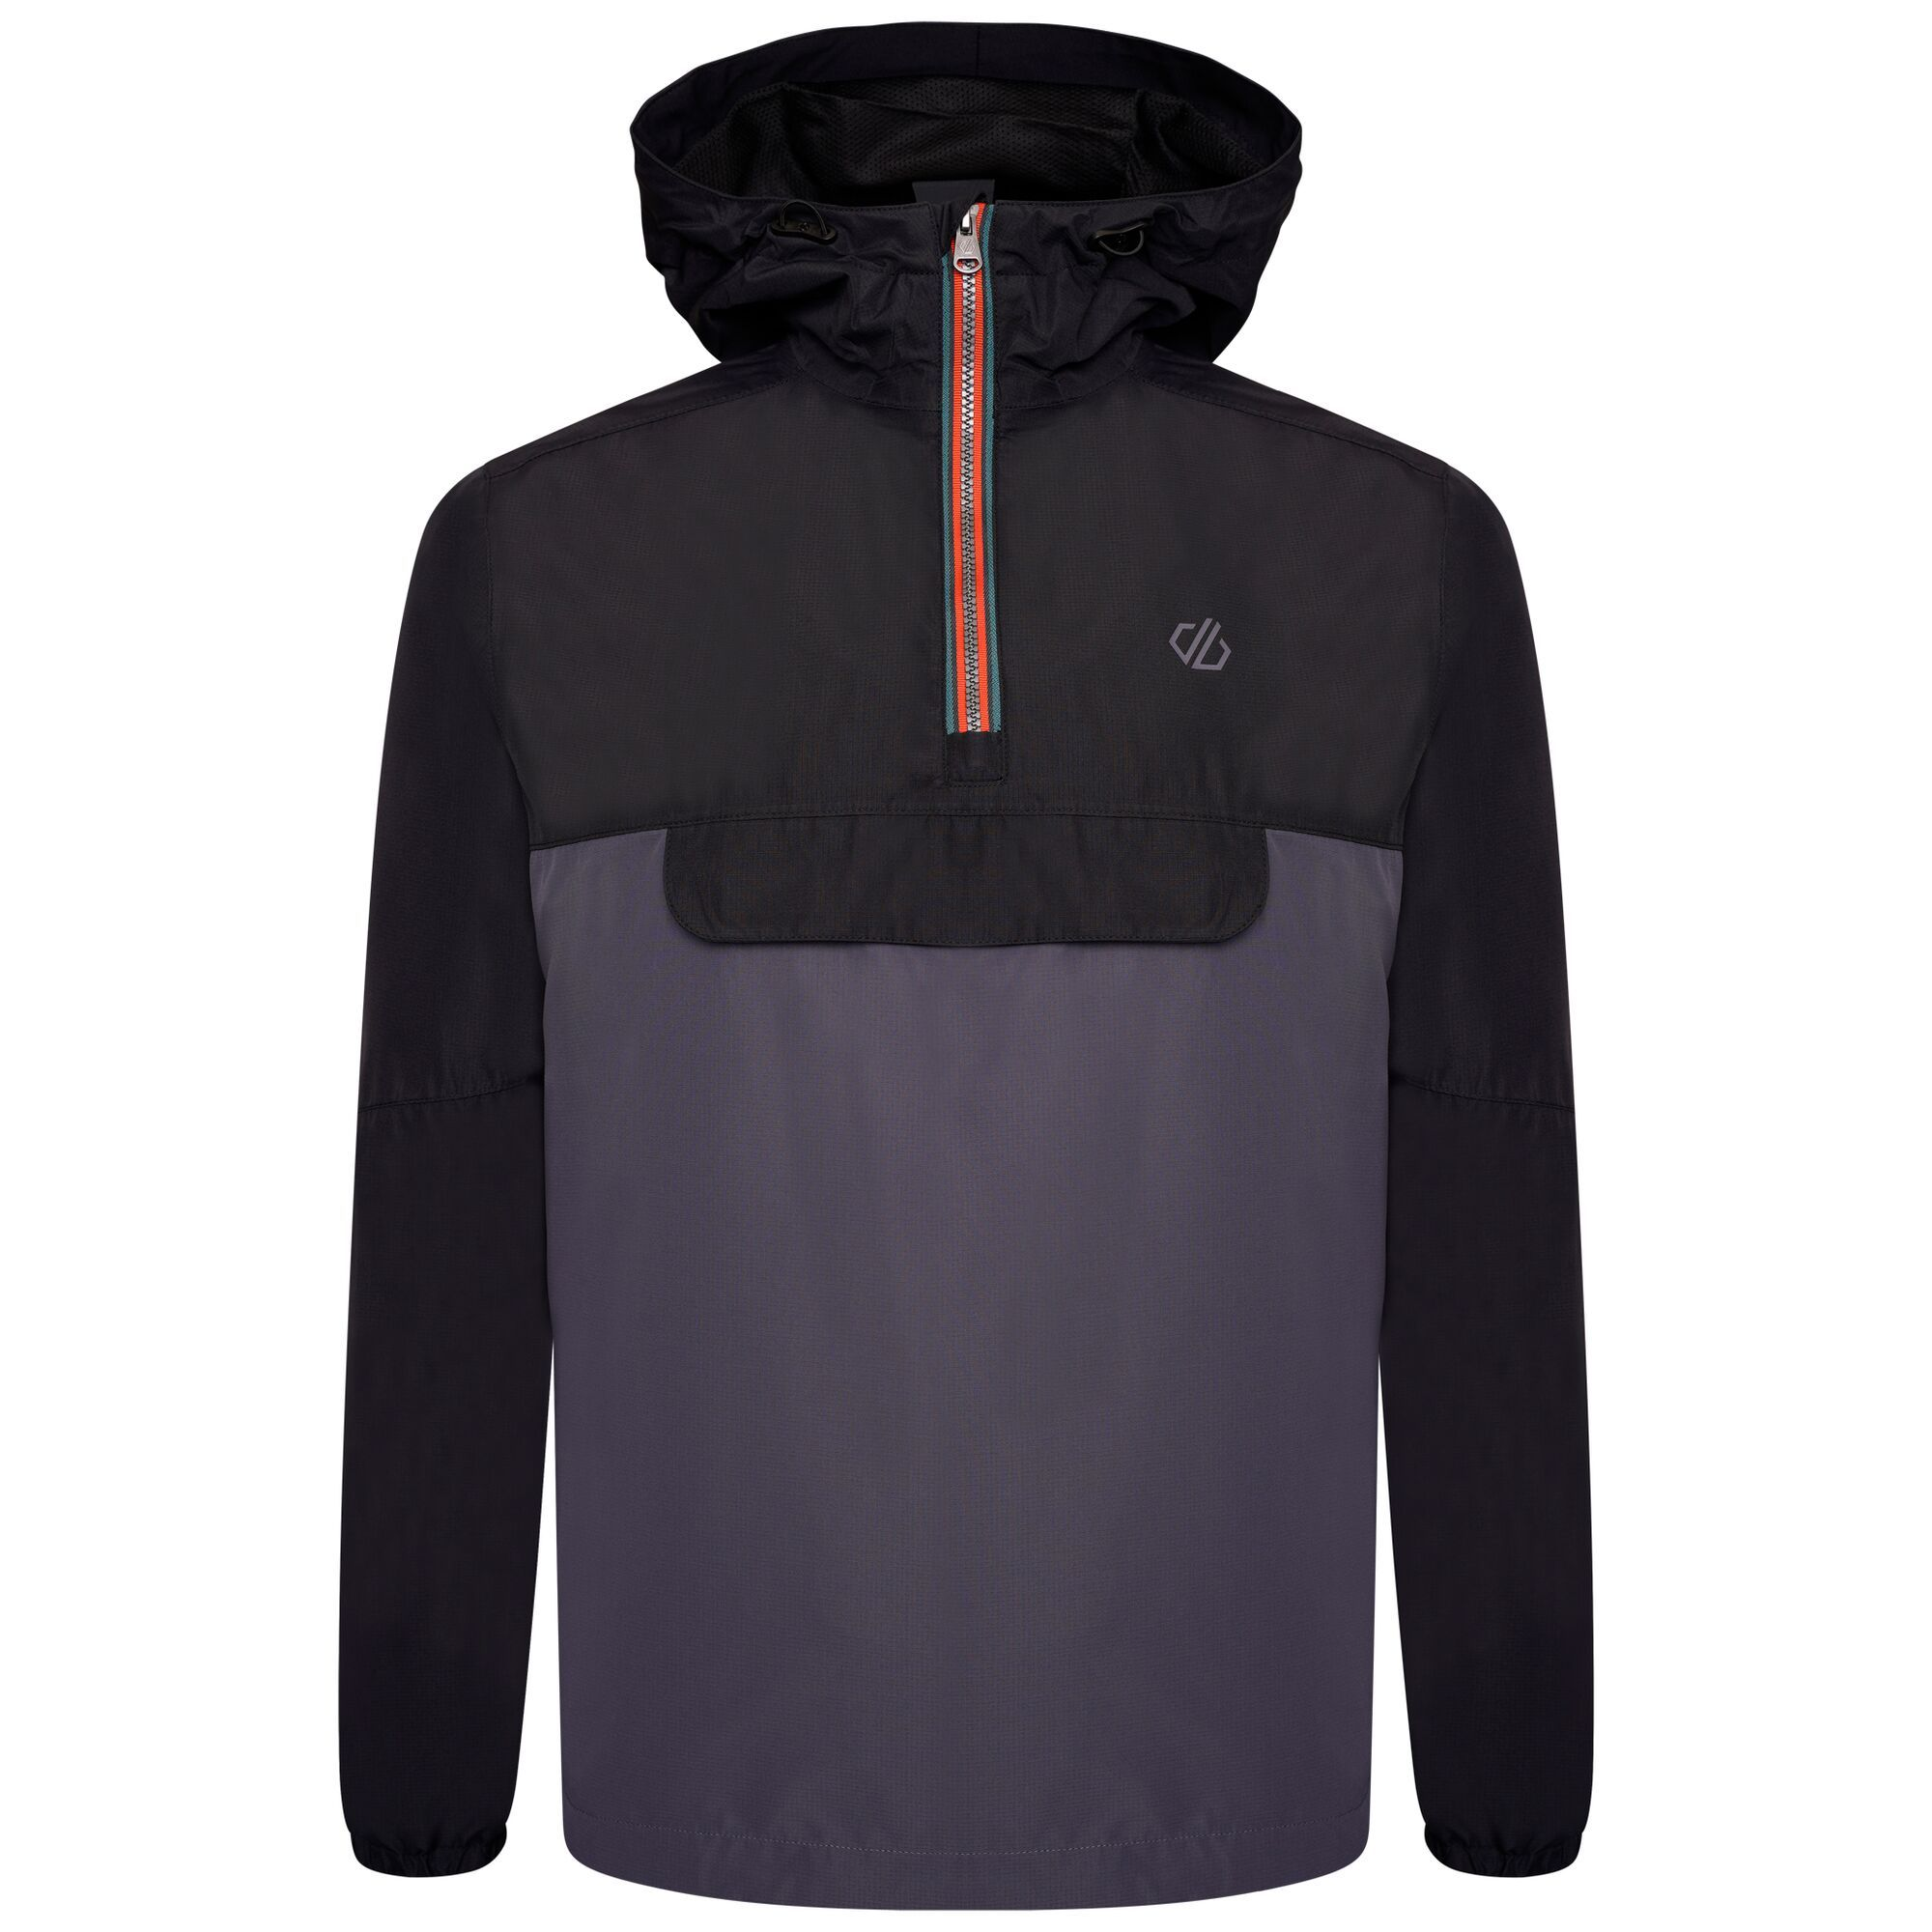 Dare 2B Mens Ceaseless Waterproof Jacket (S) (Black/Ebony)